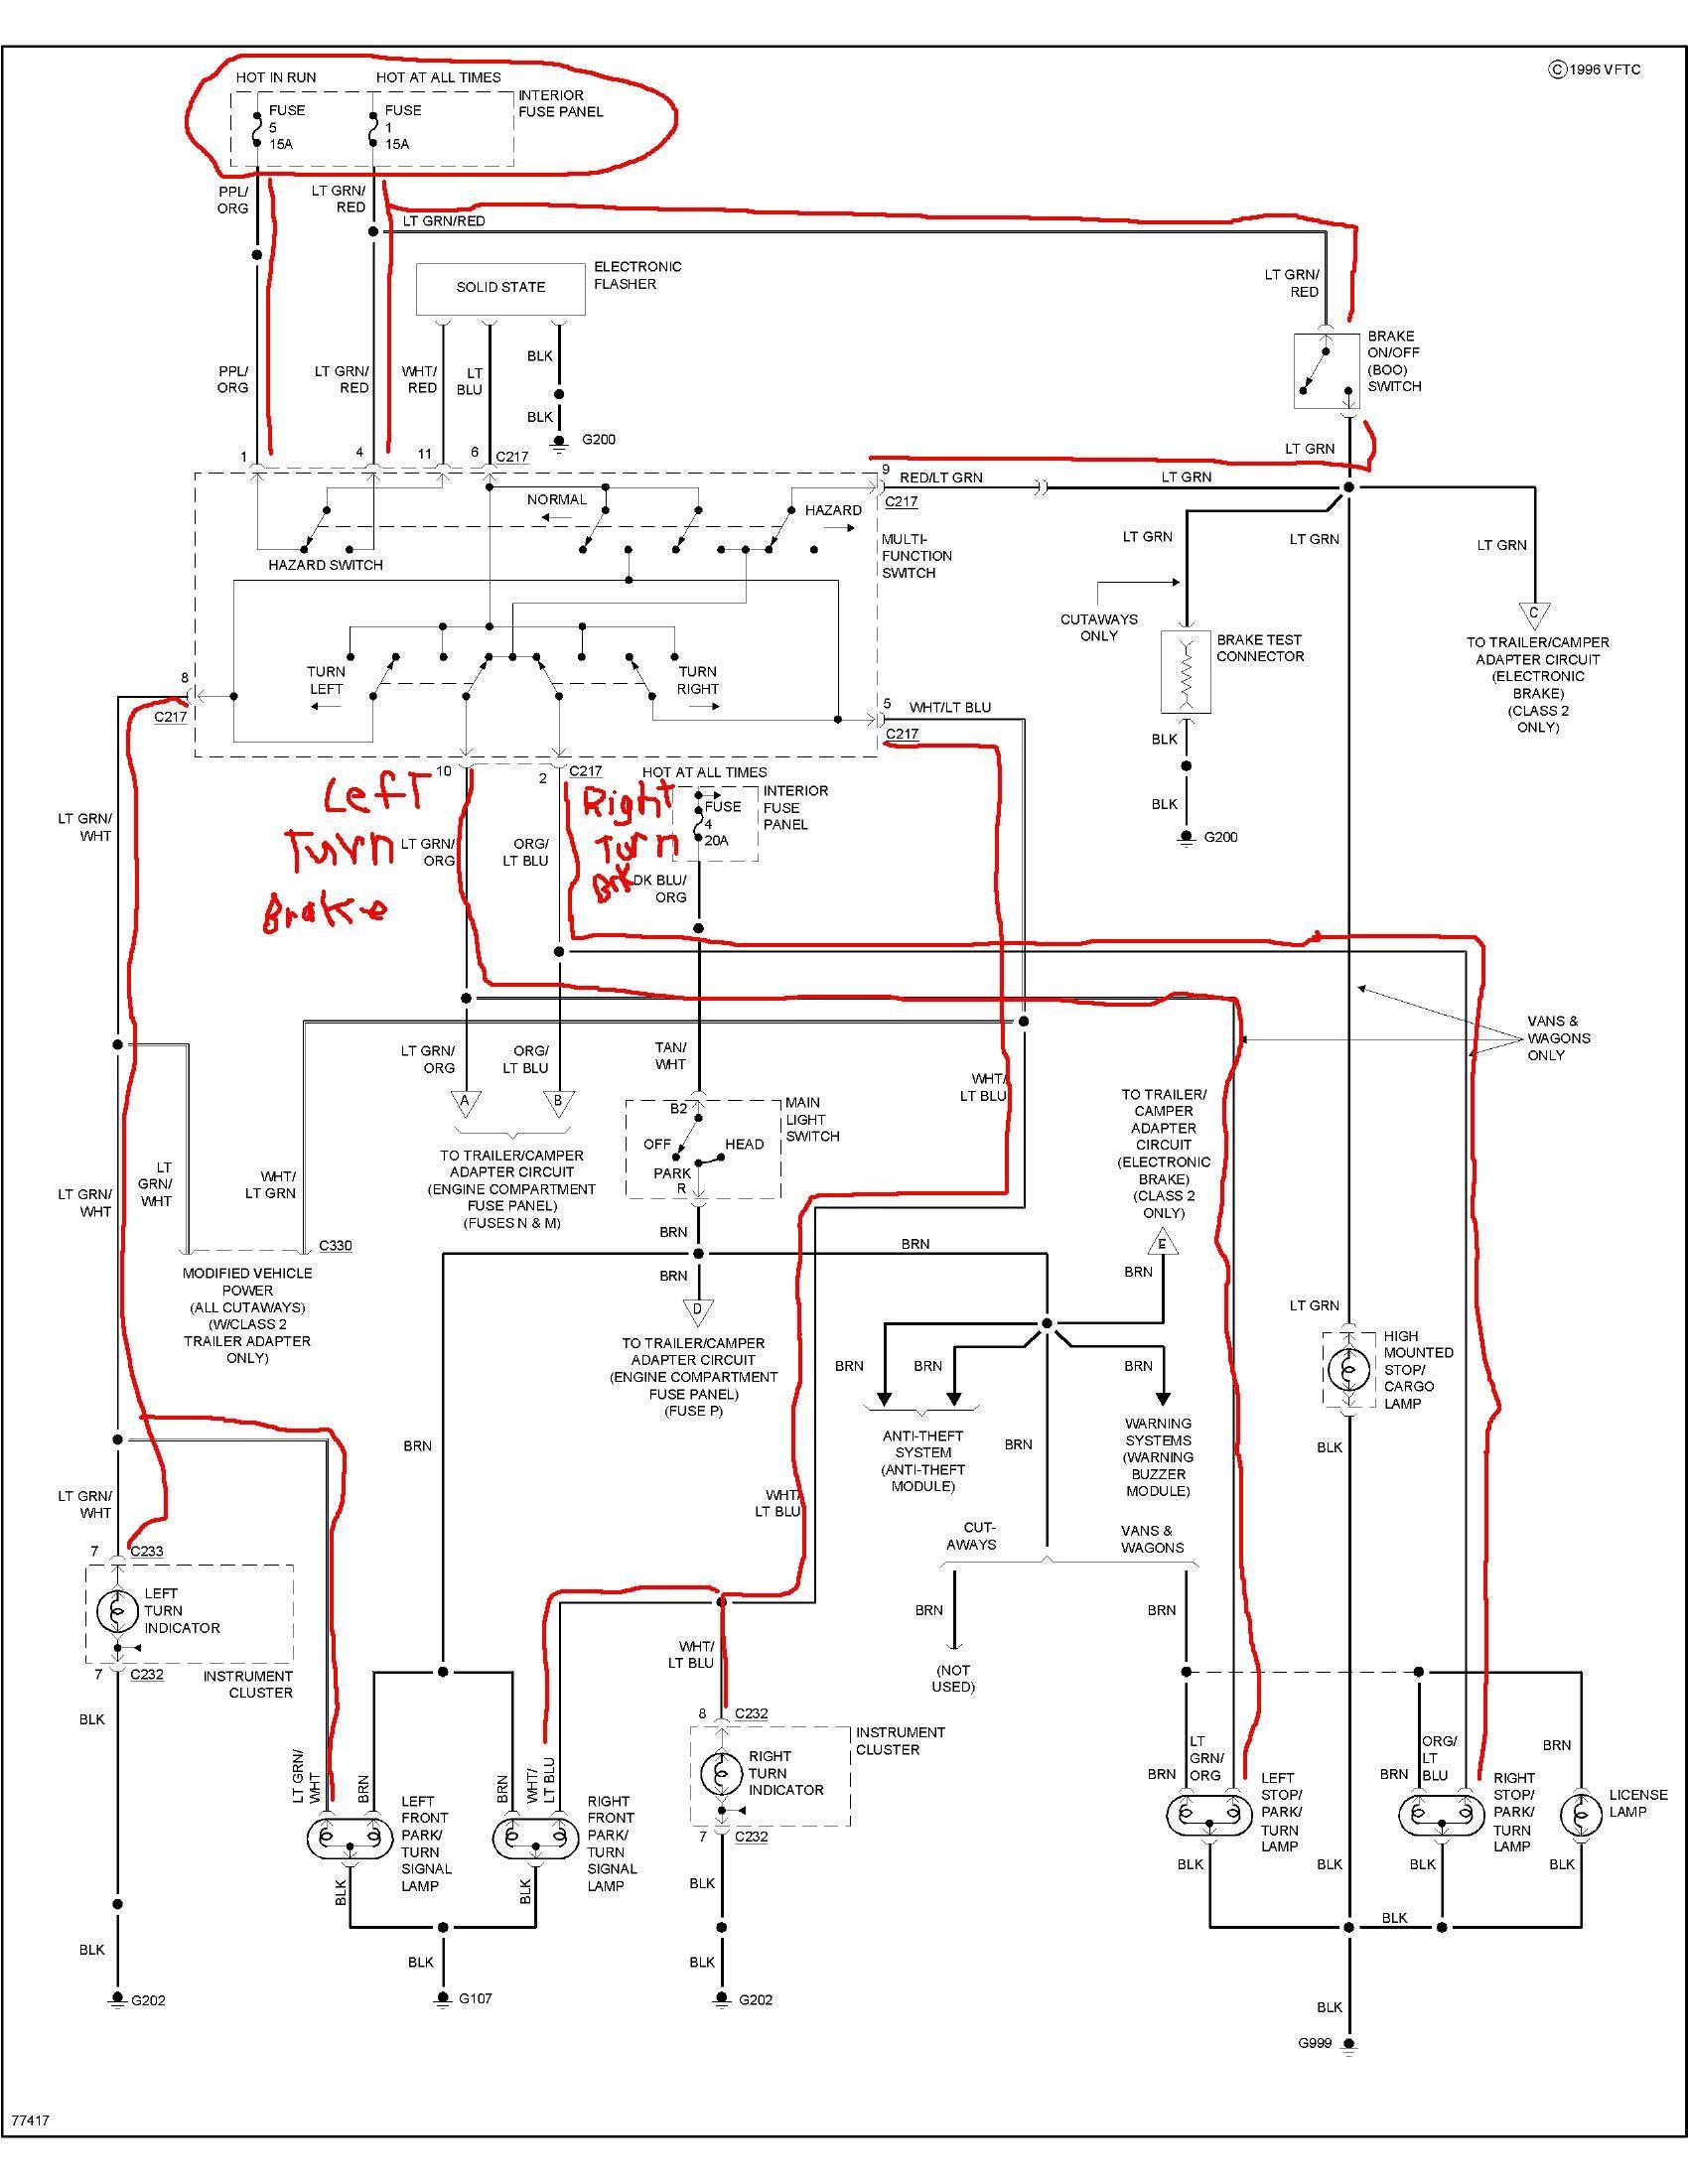 1996 ford Taurus Engine Diagram ford E 350 Wiring Diagrams Wiring Diagram Of 1996 ford Taurus Engine Diagram